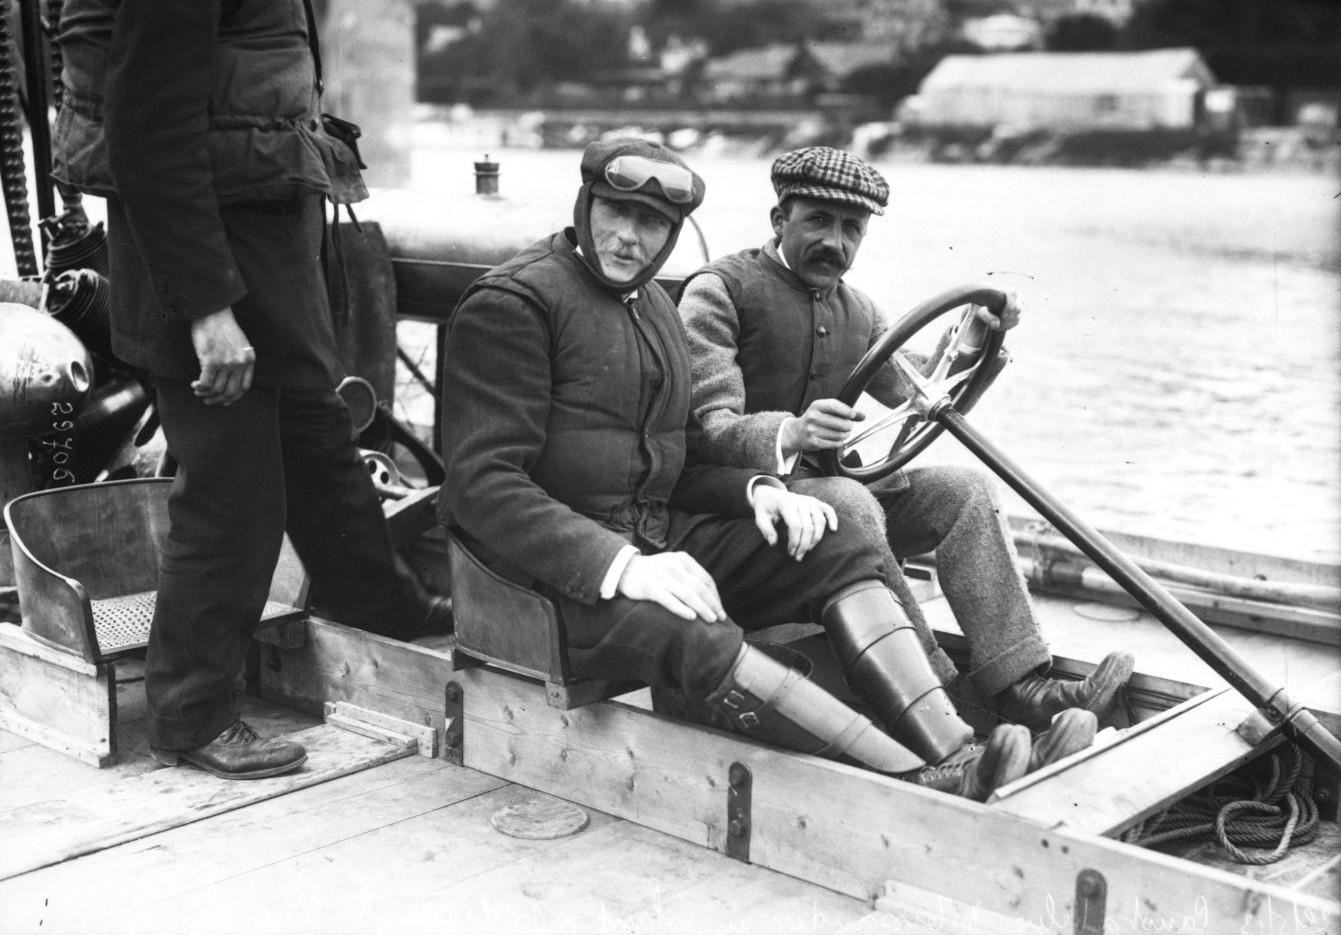 22-5-1913 canot à hélice Comte de Lambert et Tissandier Agence Rol